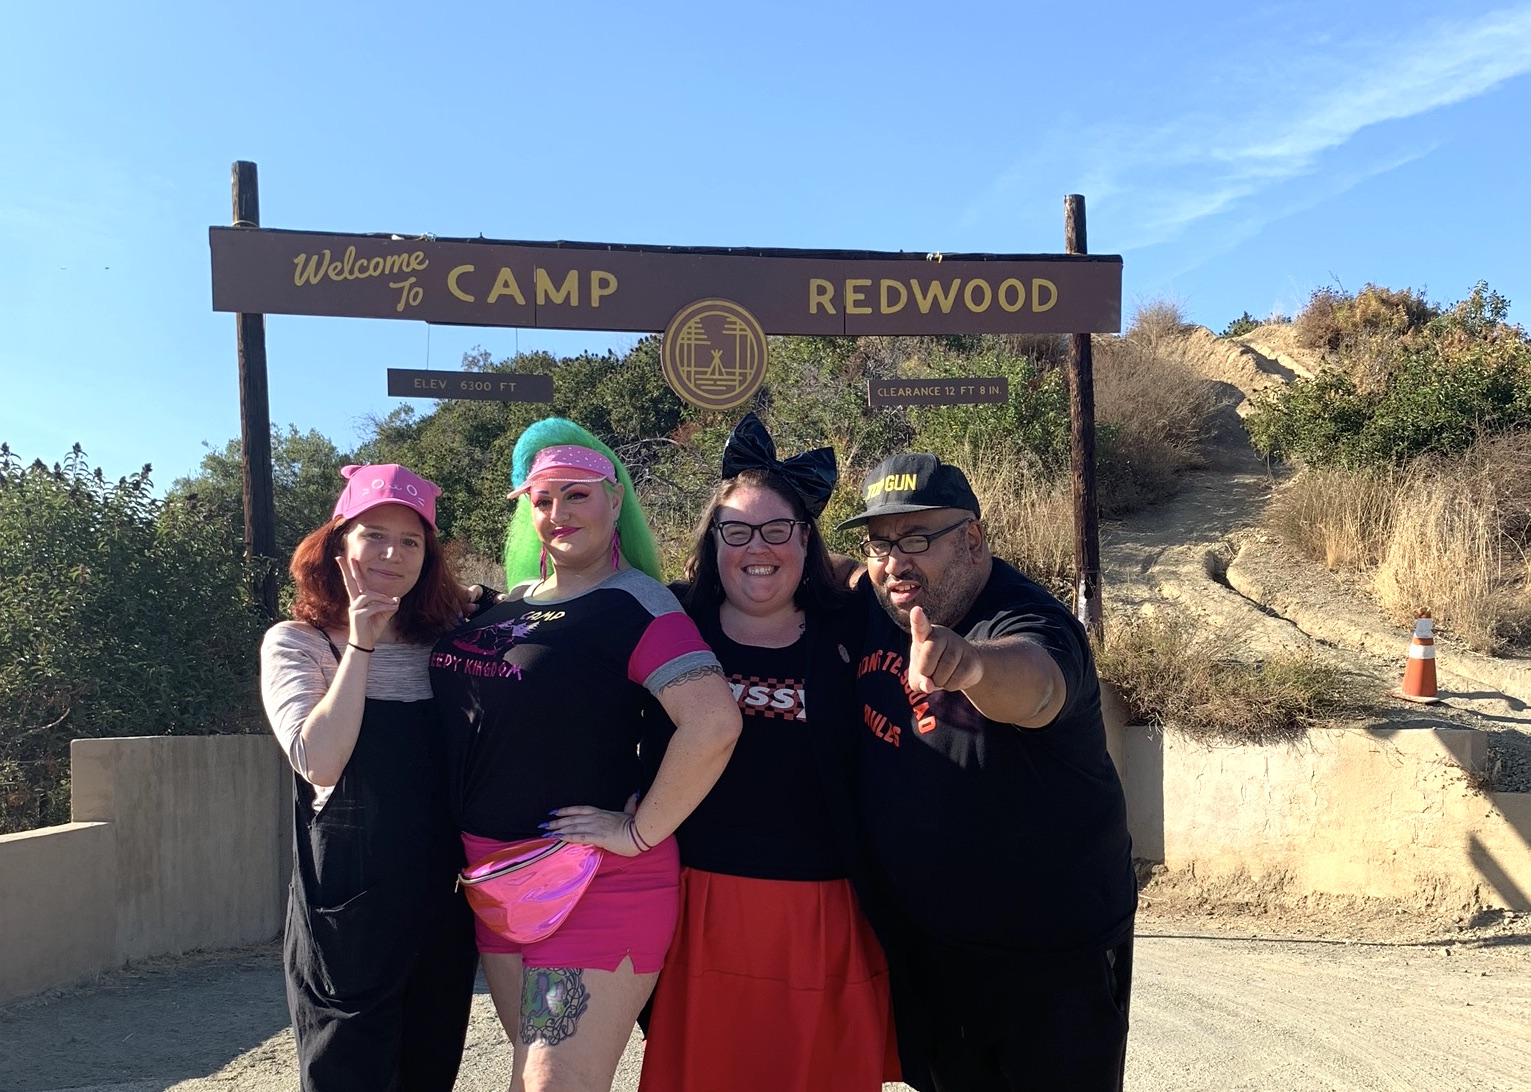 Event Recap: Our Trip to Camp Redwood